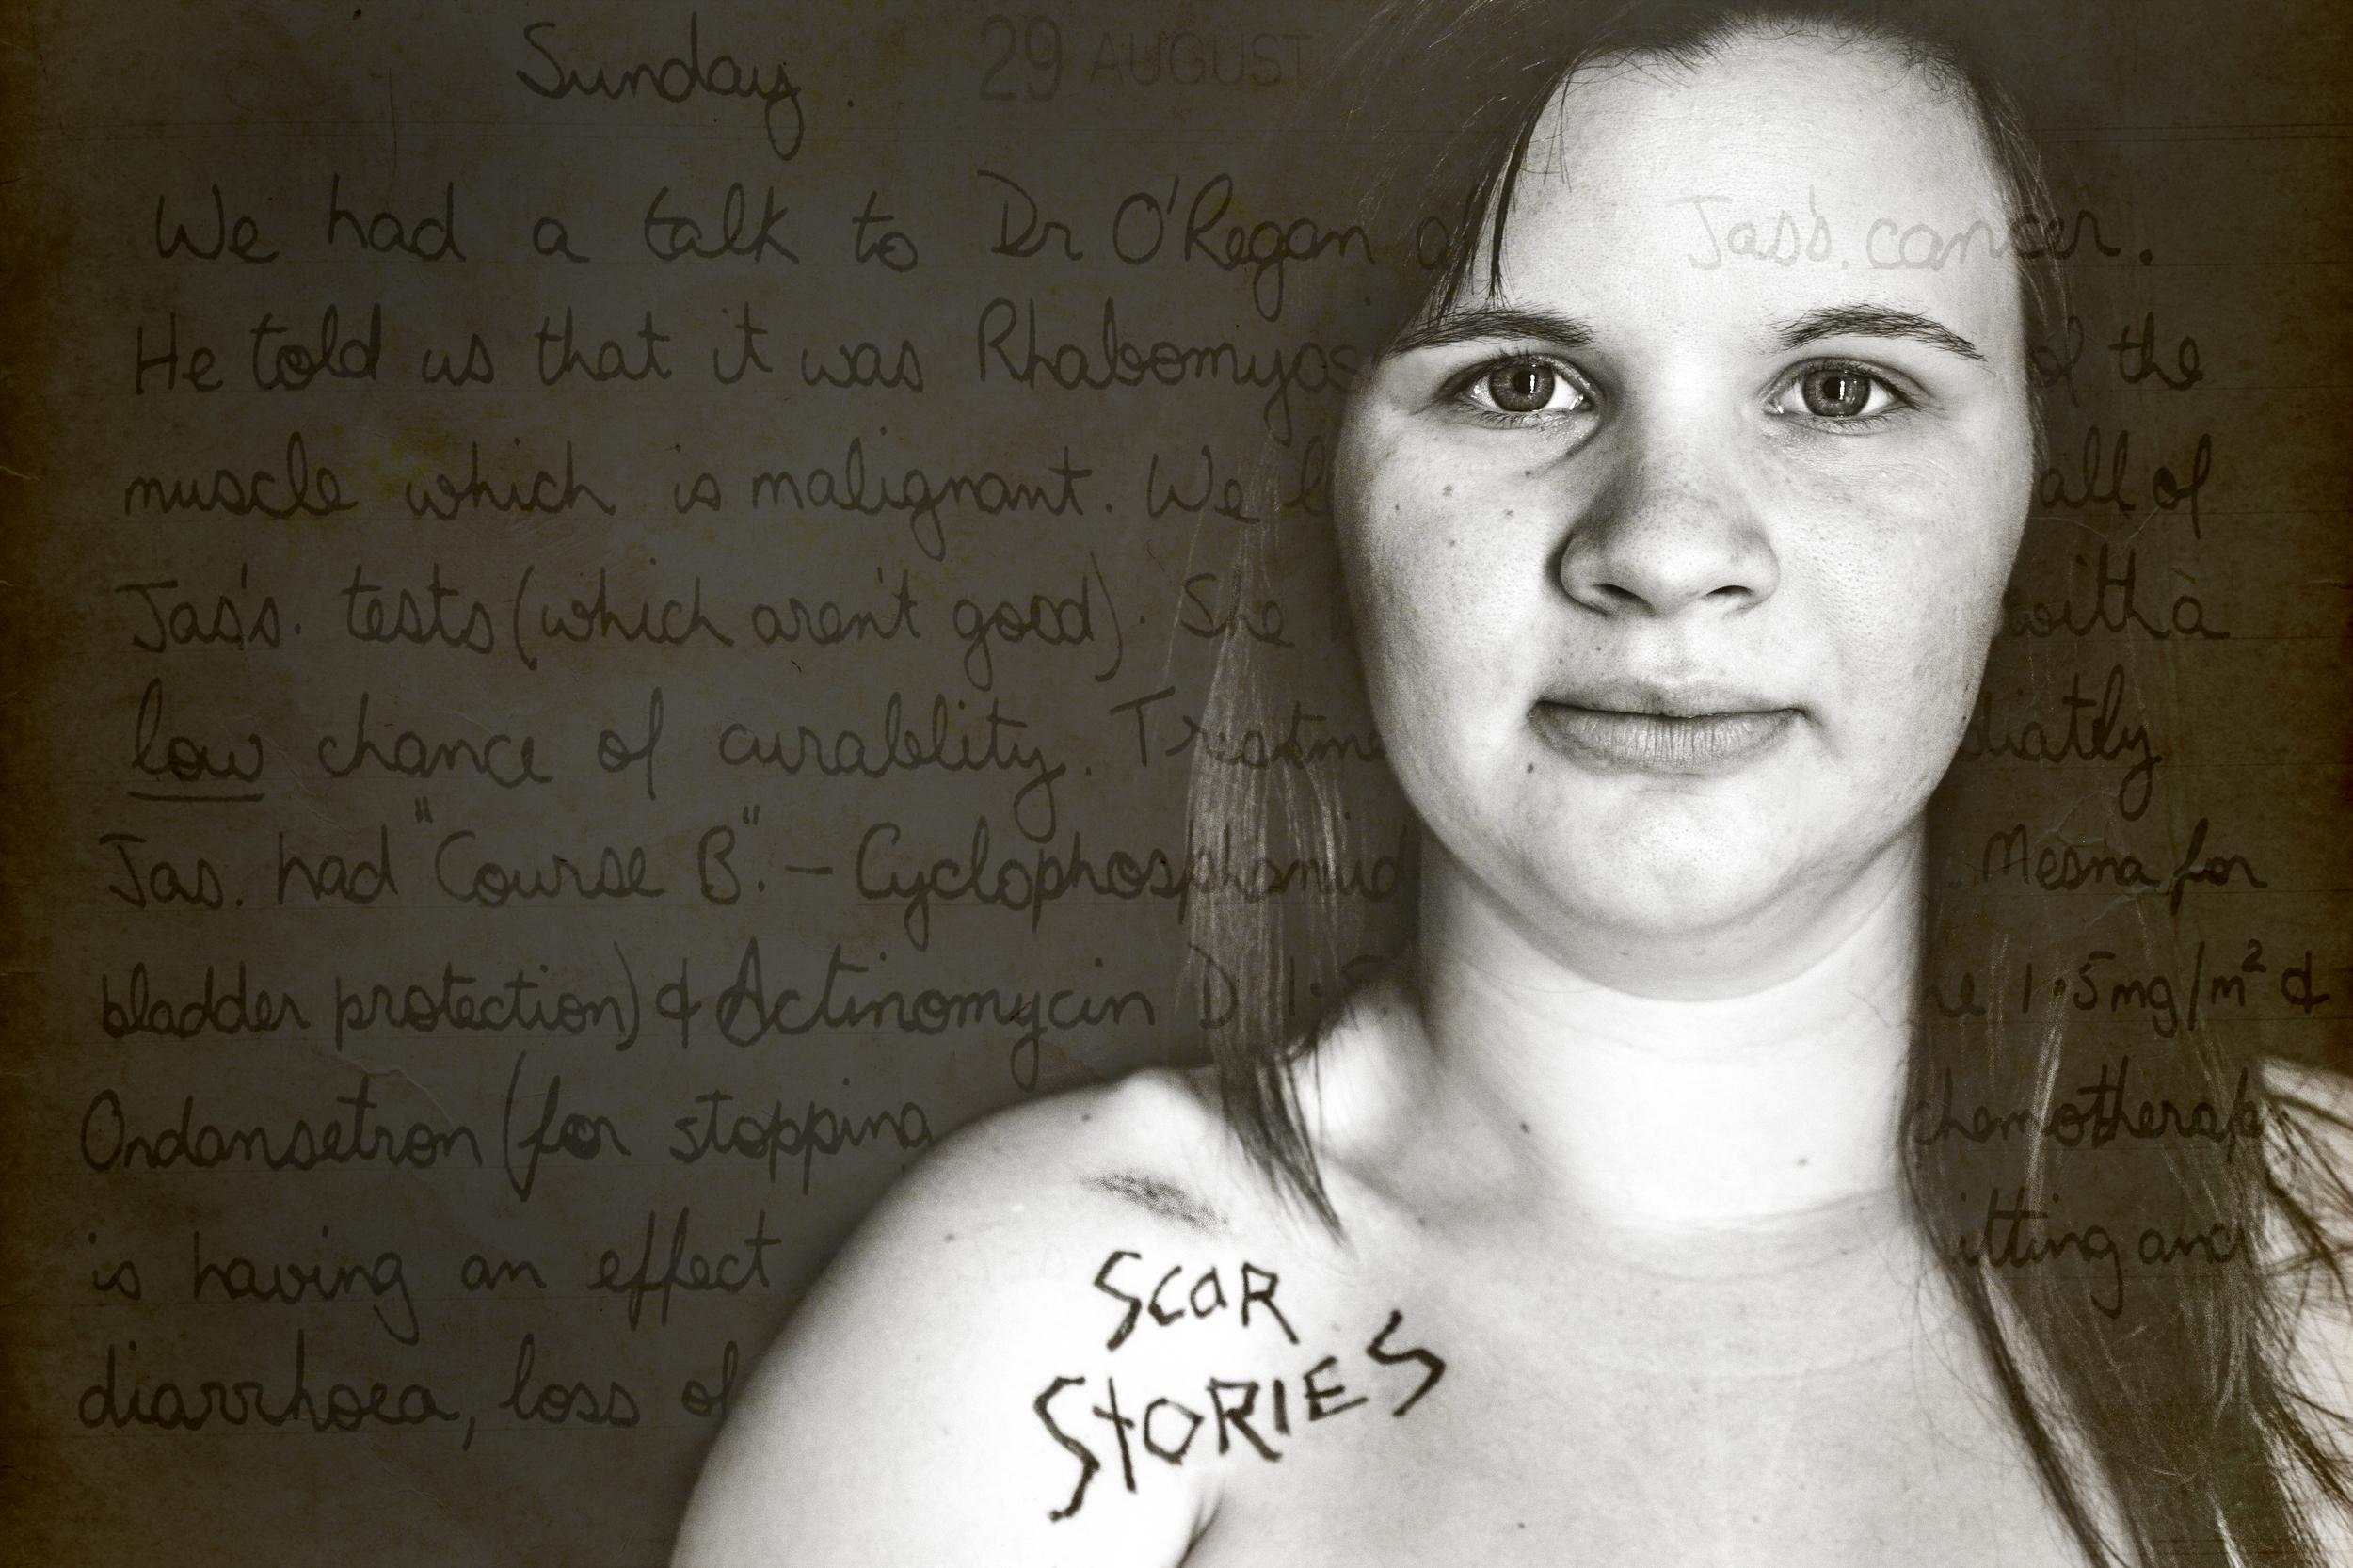 Scar Stories Jas Rhabdomyosarcoma by Charmaine Lyons